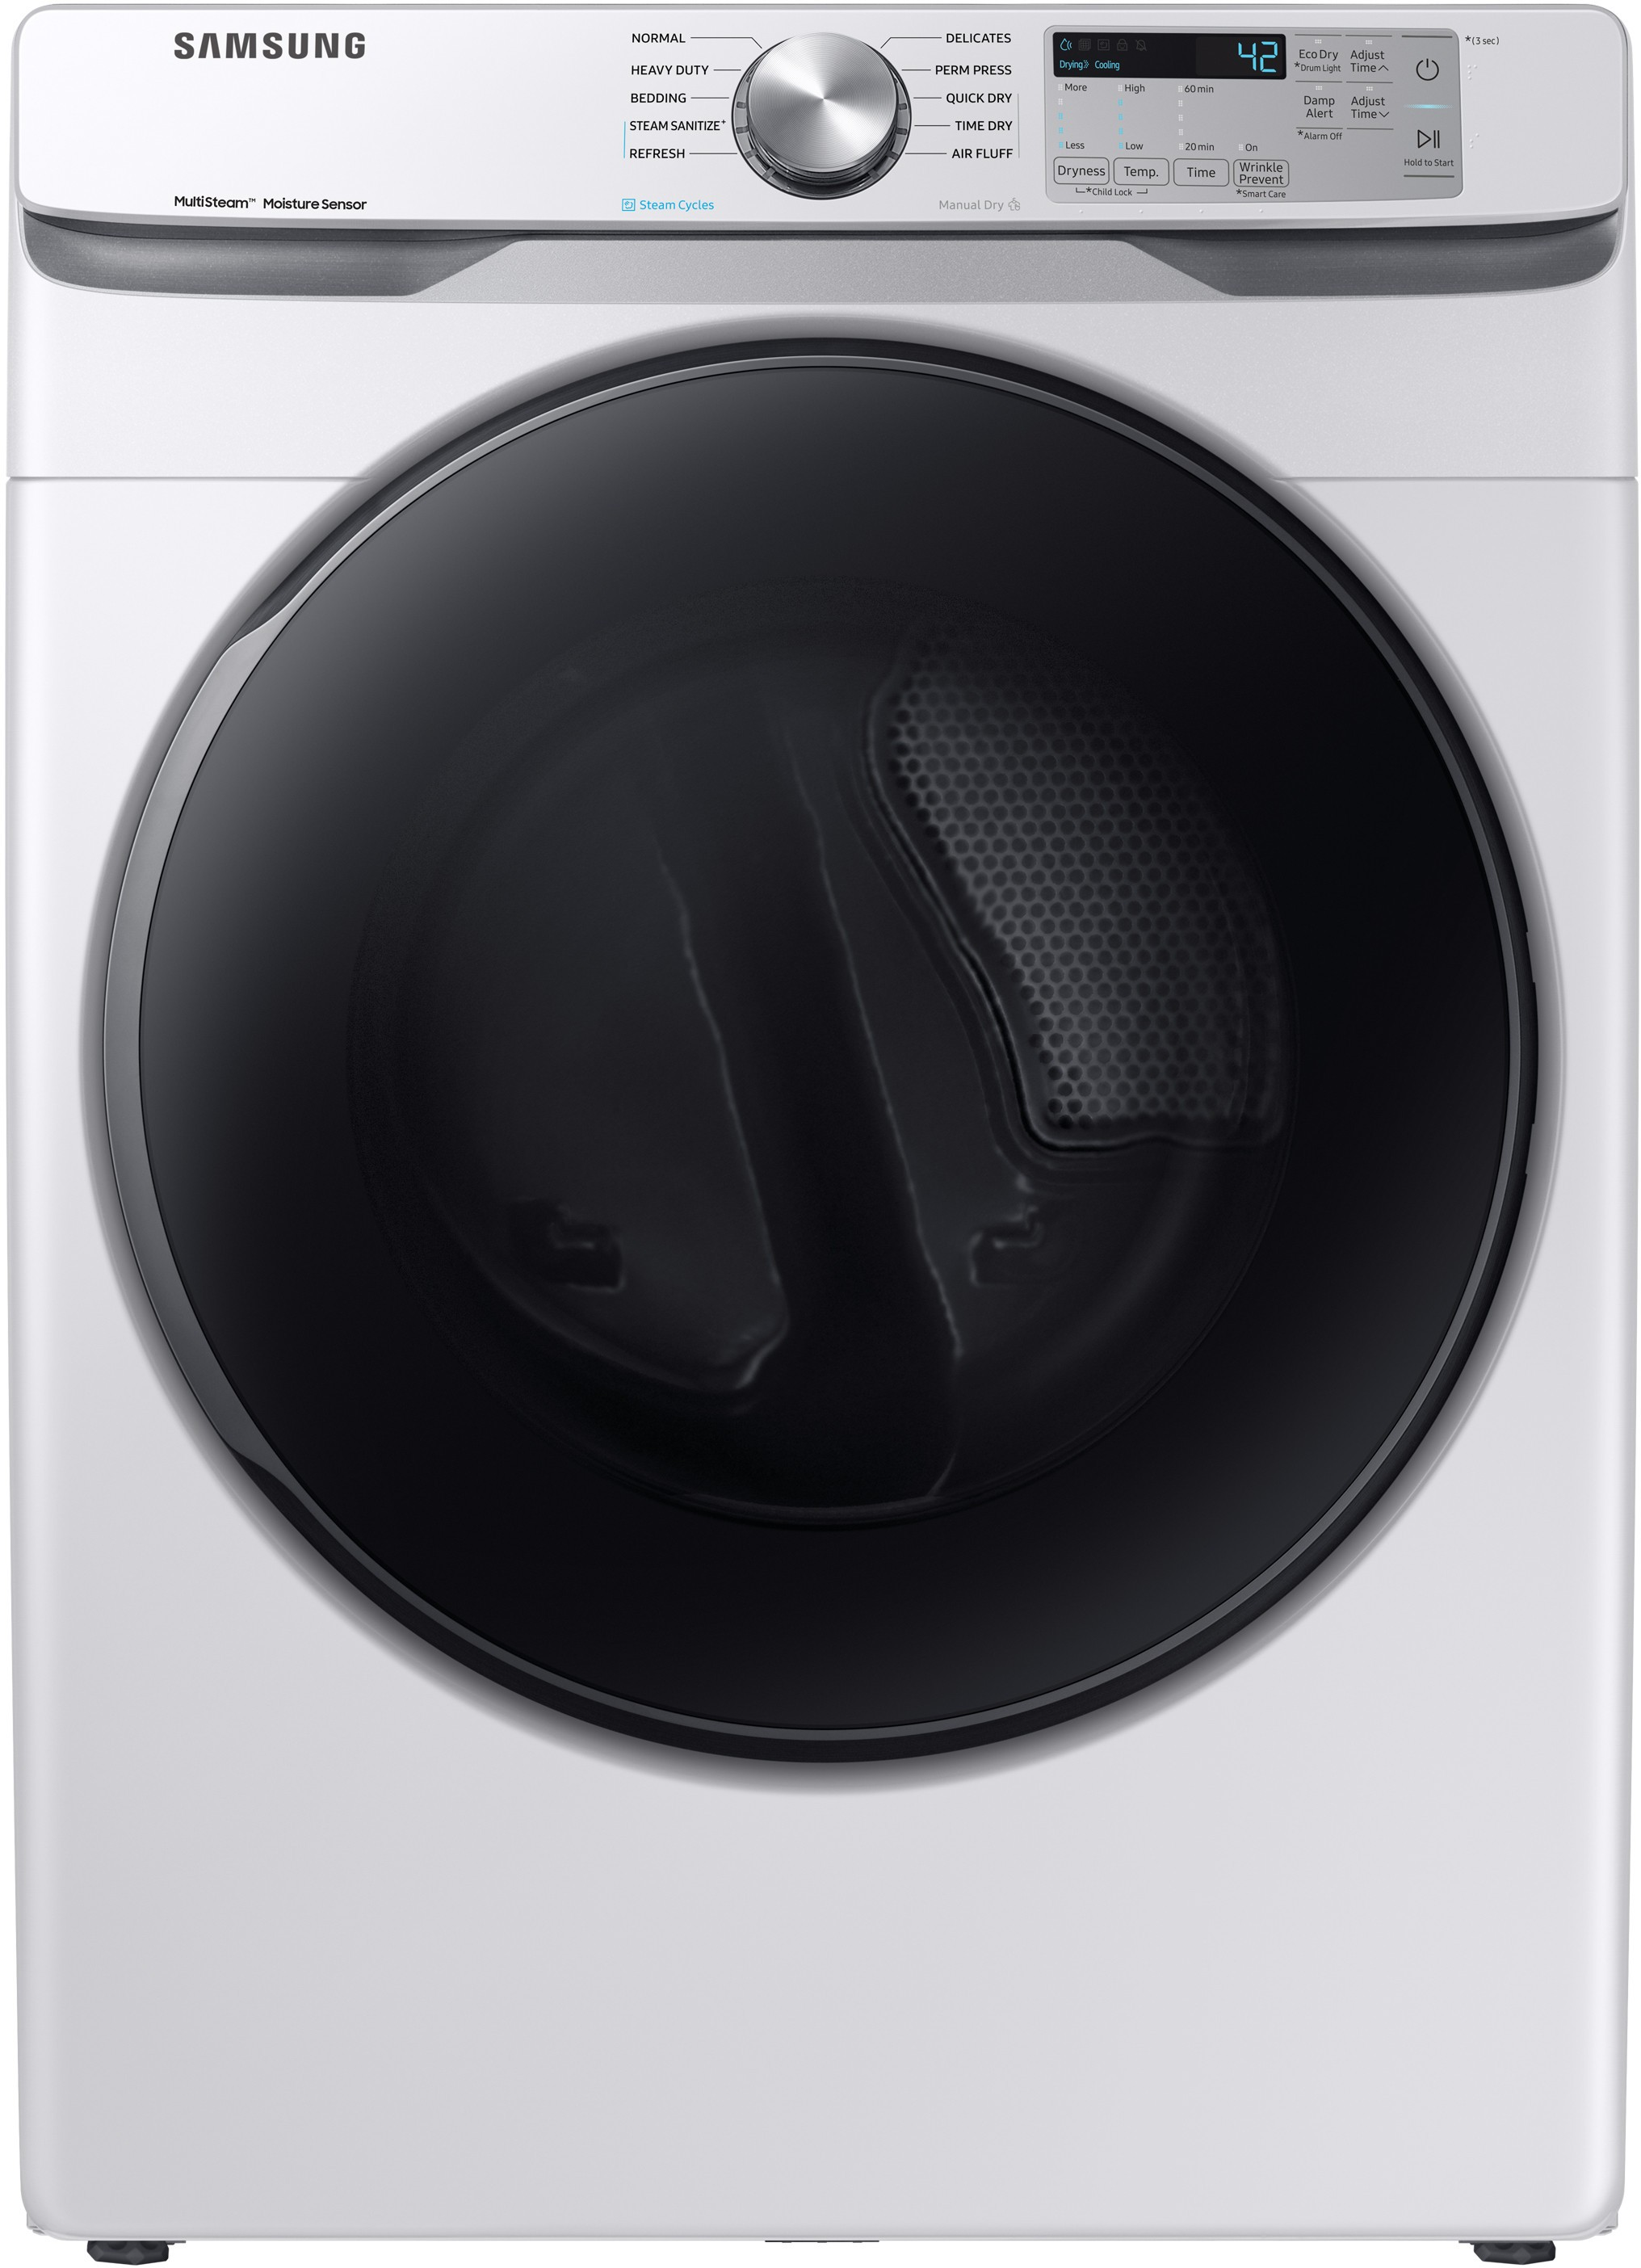 Wiring Diagrahm for Samsung Gas Dryer Samsung Dvg45r6100w Of Wiring Diagrahm for Samsung Gas Dryer